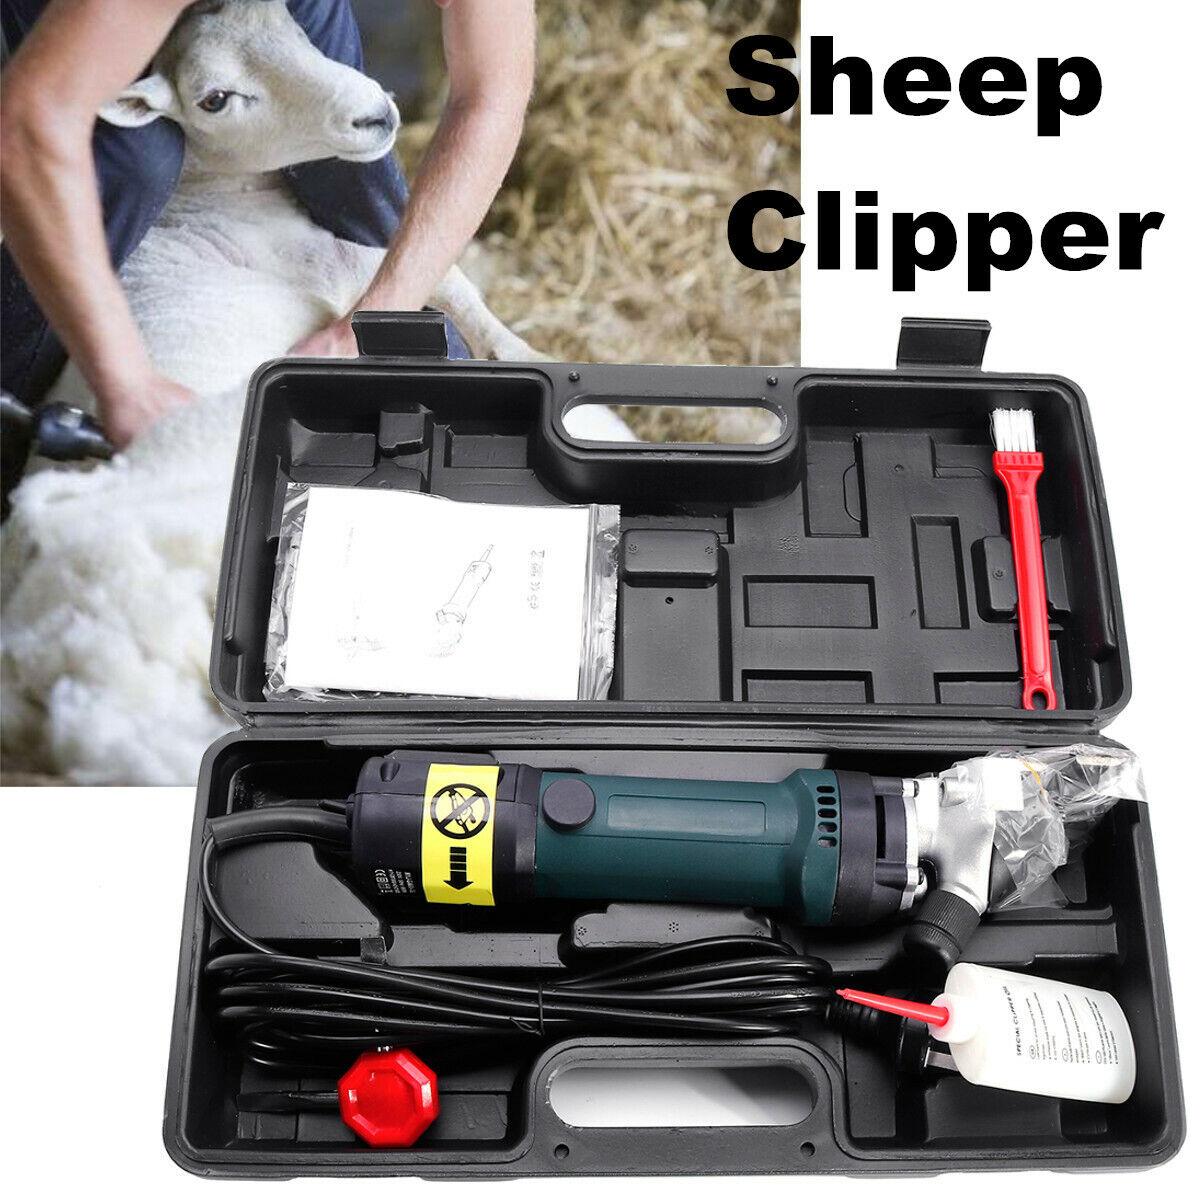 690W ELETTRICO Pet PECORE TOSATURA Clipper Clipper Clipper a taglio Fattoria Capra Alpaca Lana Cut Trimmer f82147